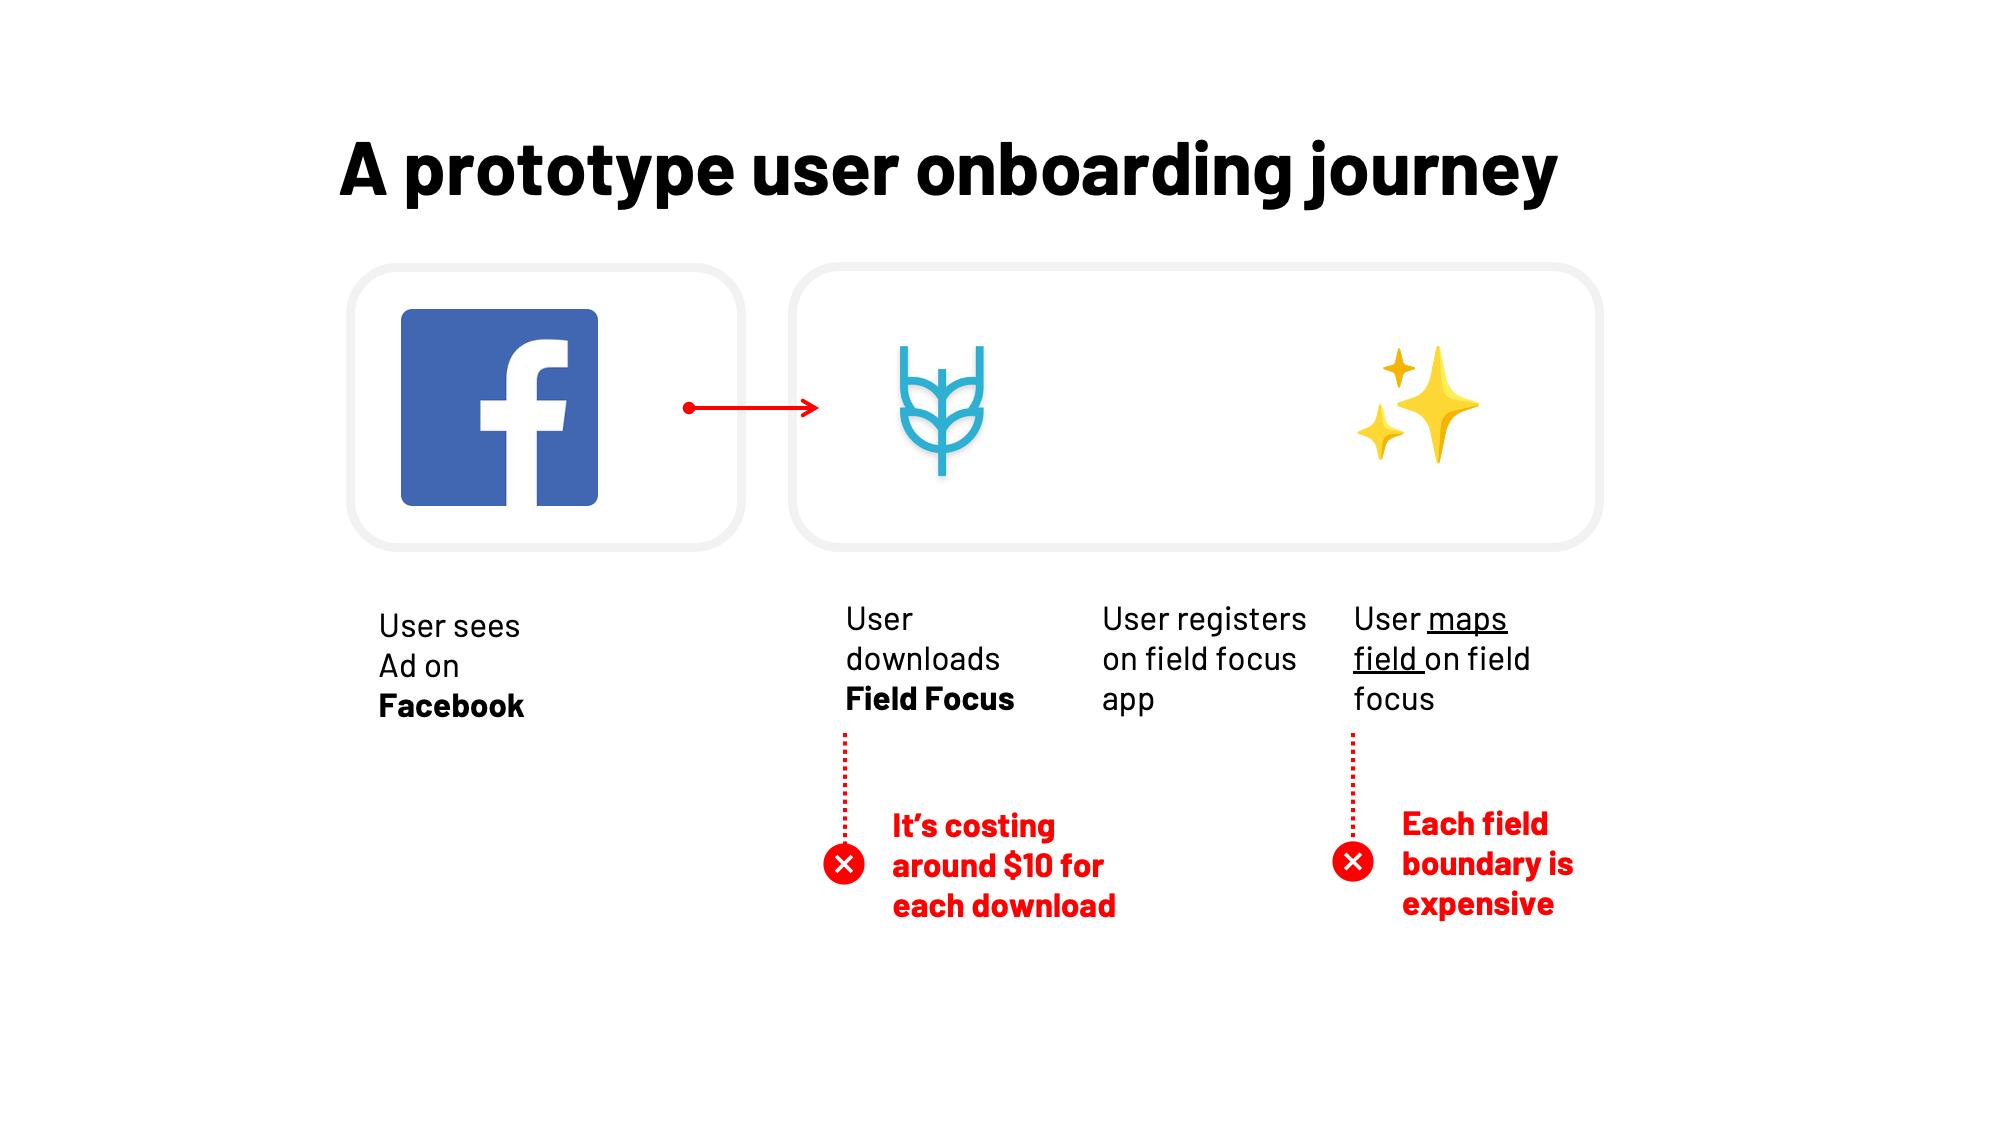 A prototype onboarding journey